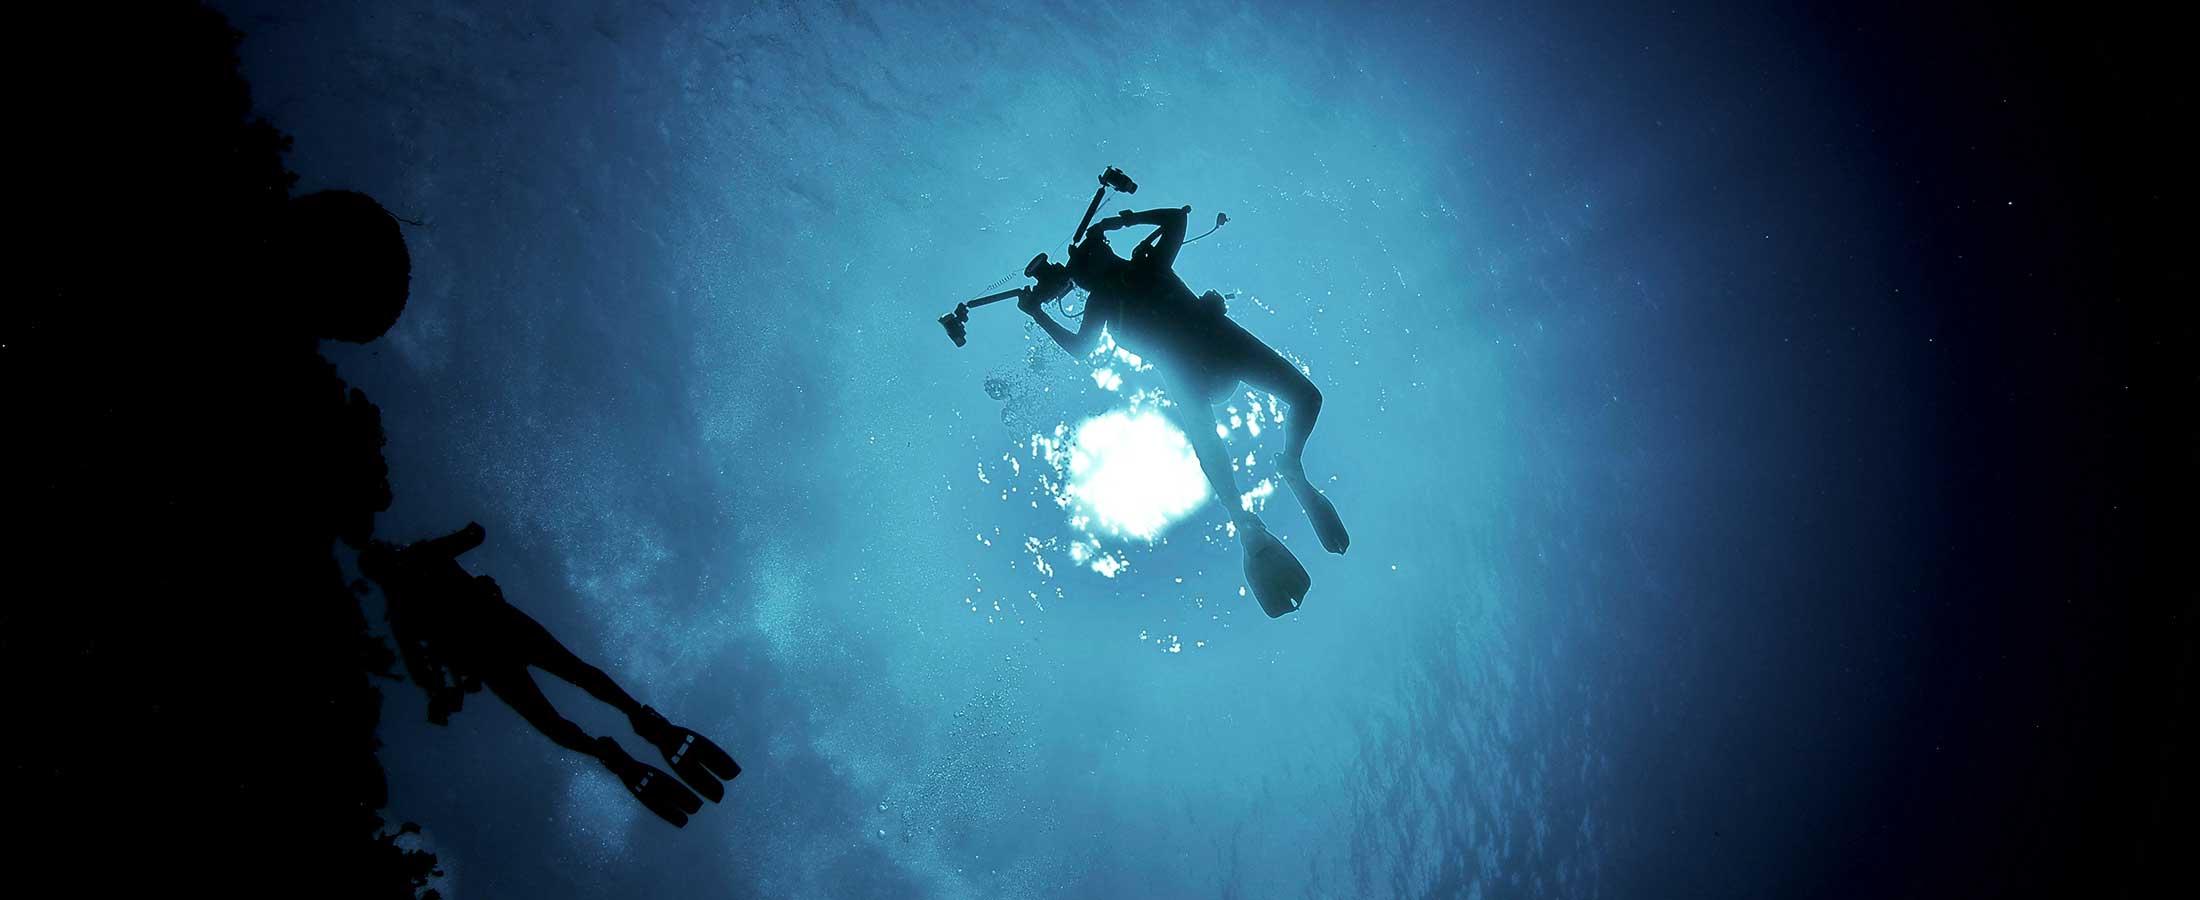 North Pole Cave dive site